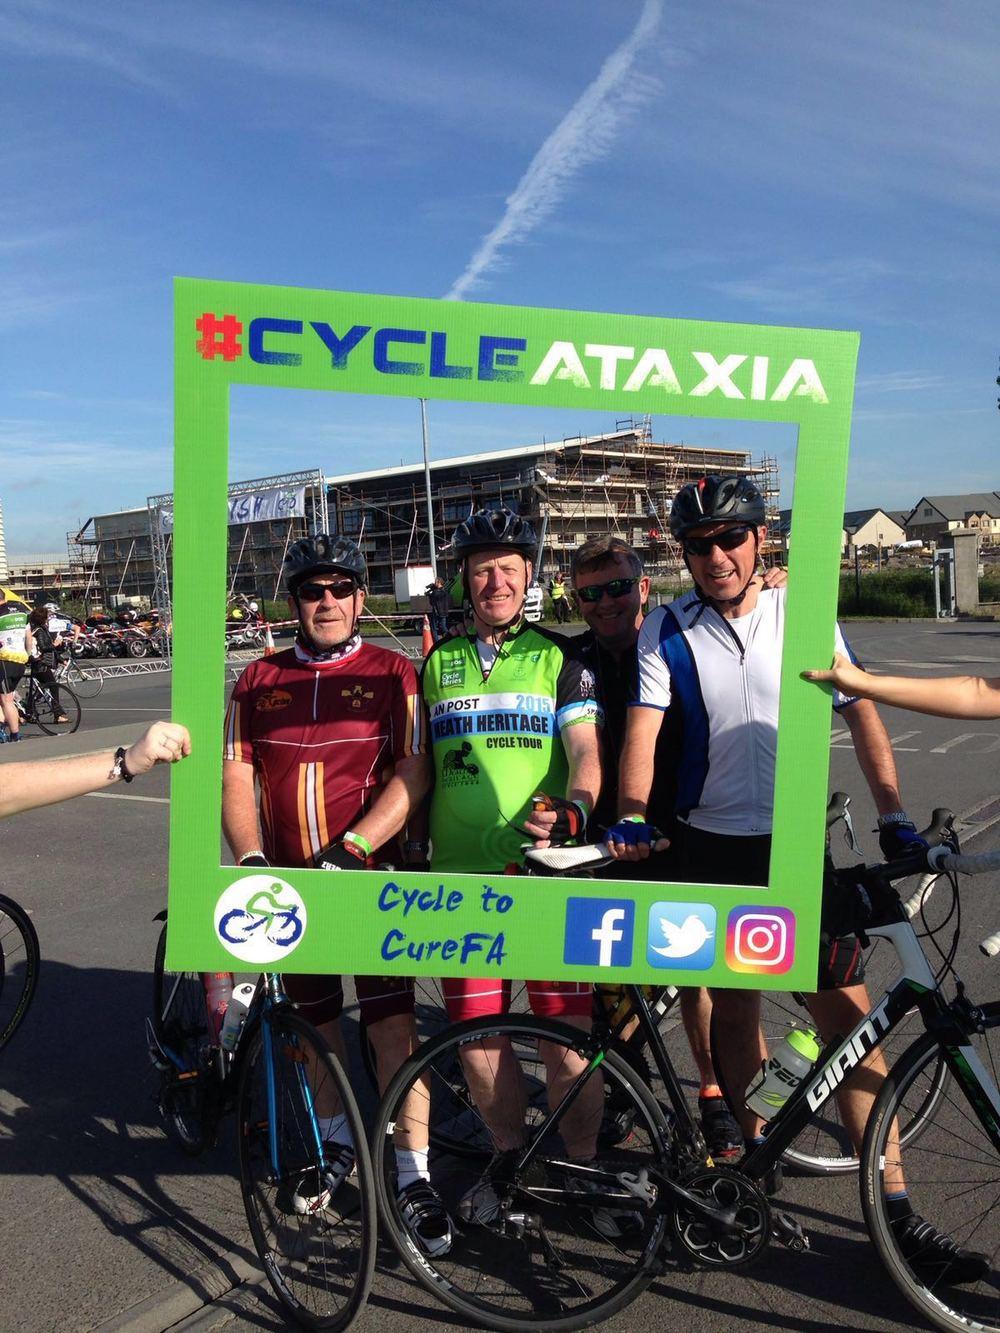 Cycle Ataxia Venue (76).JPG